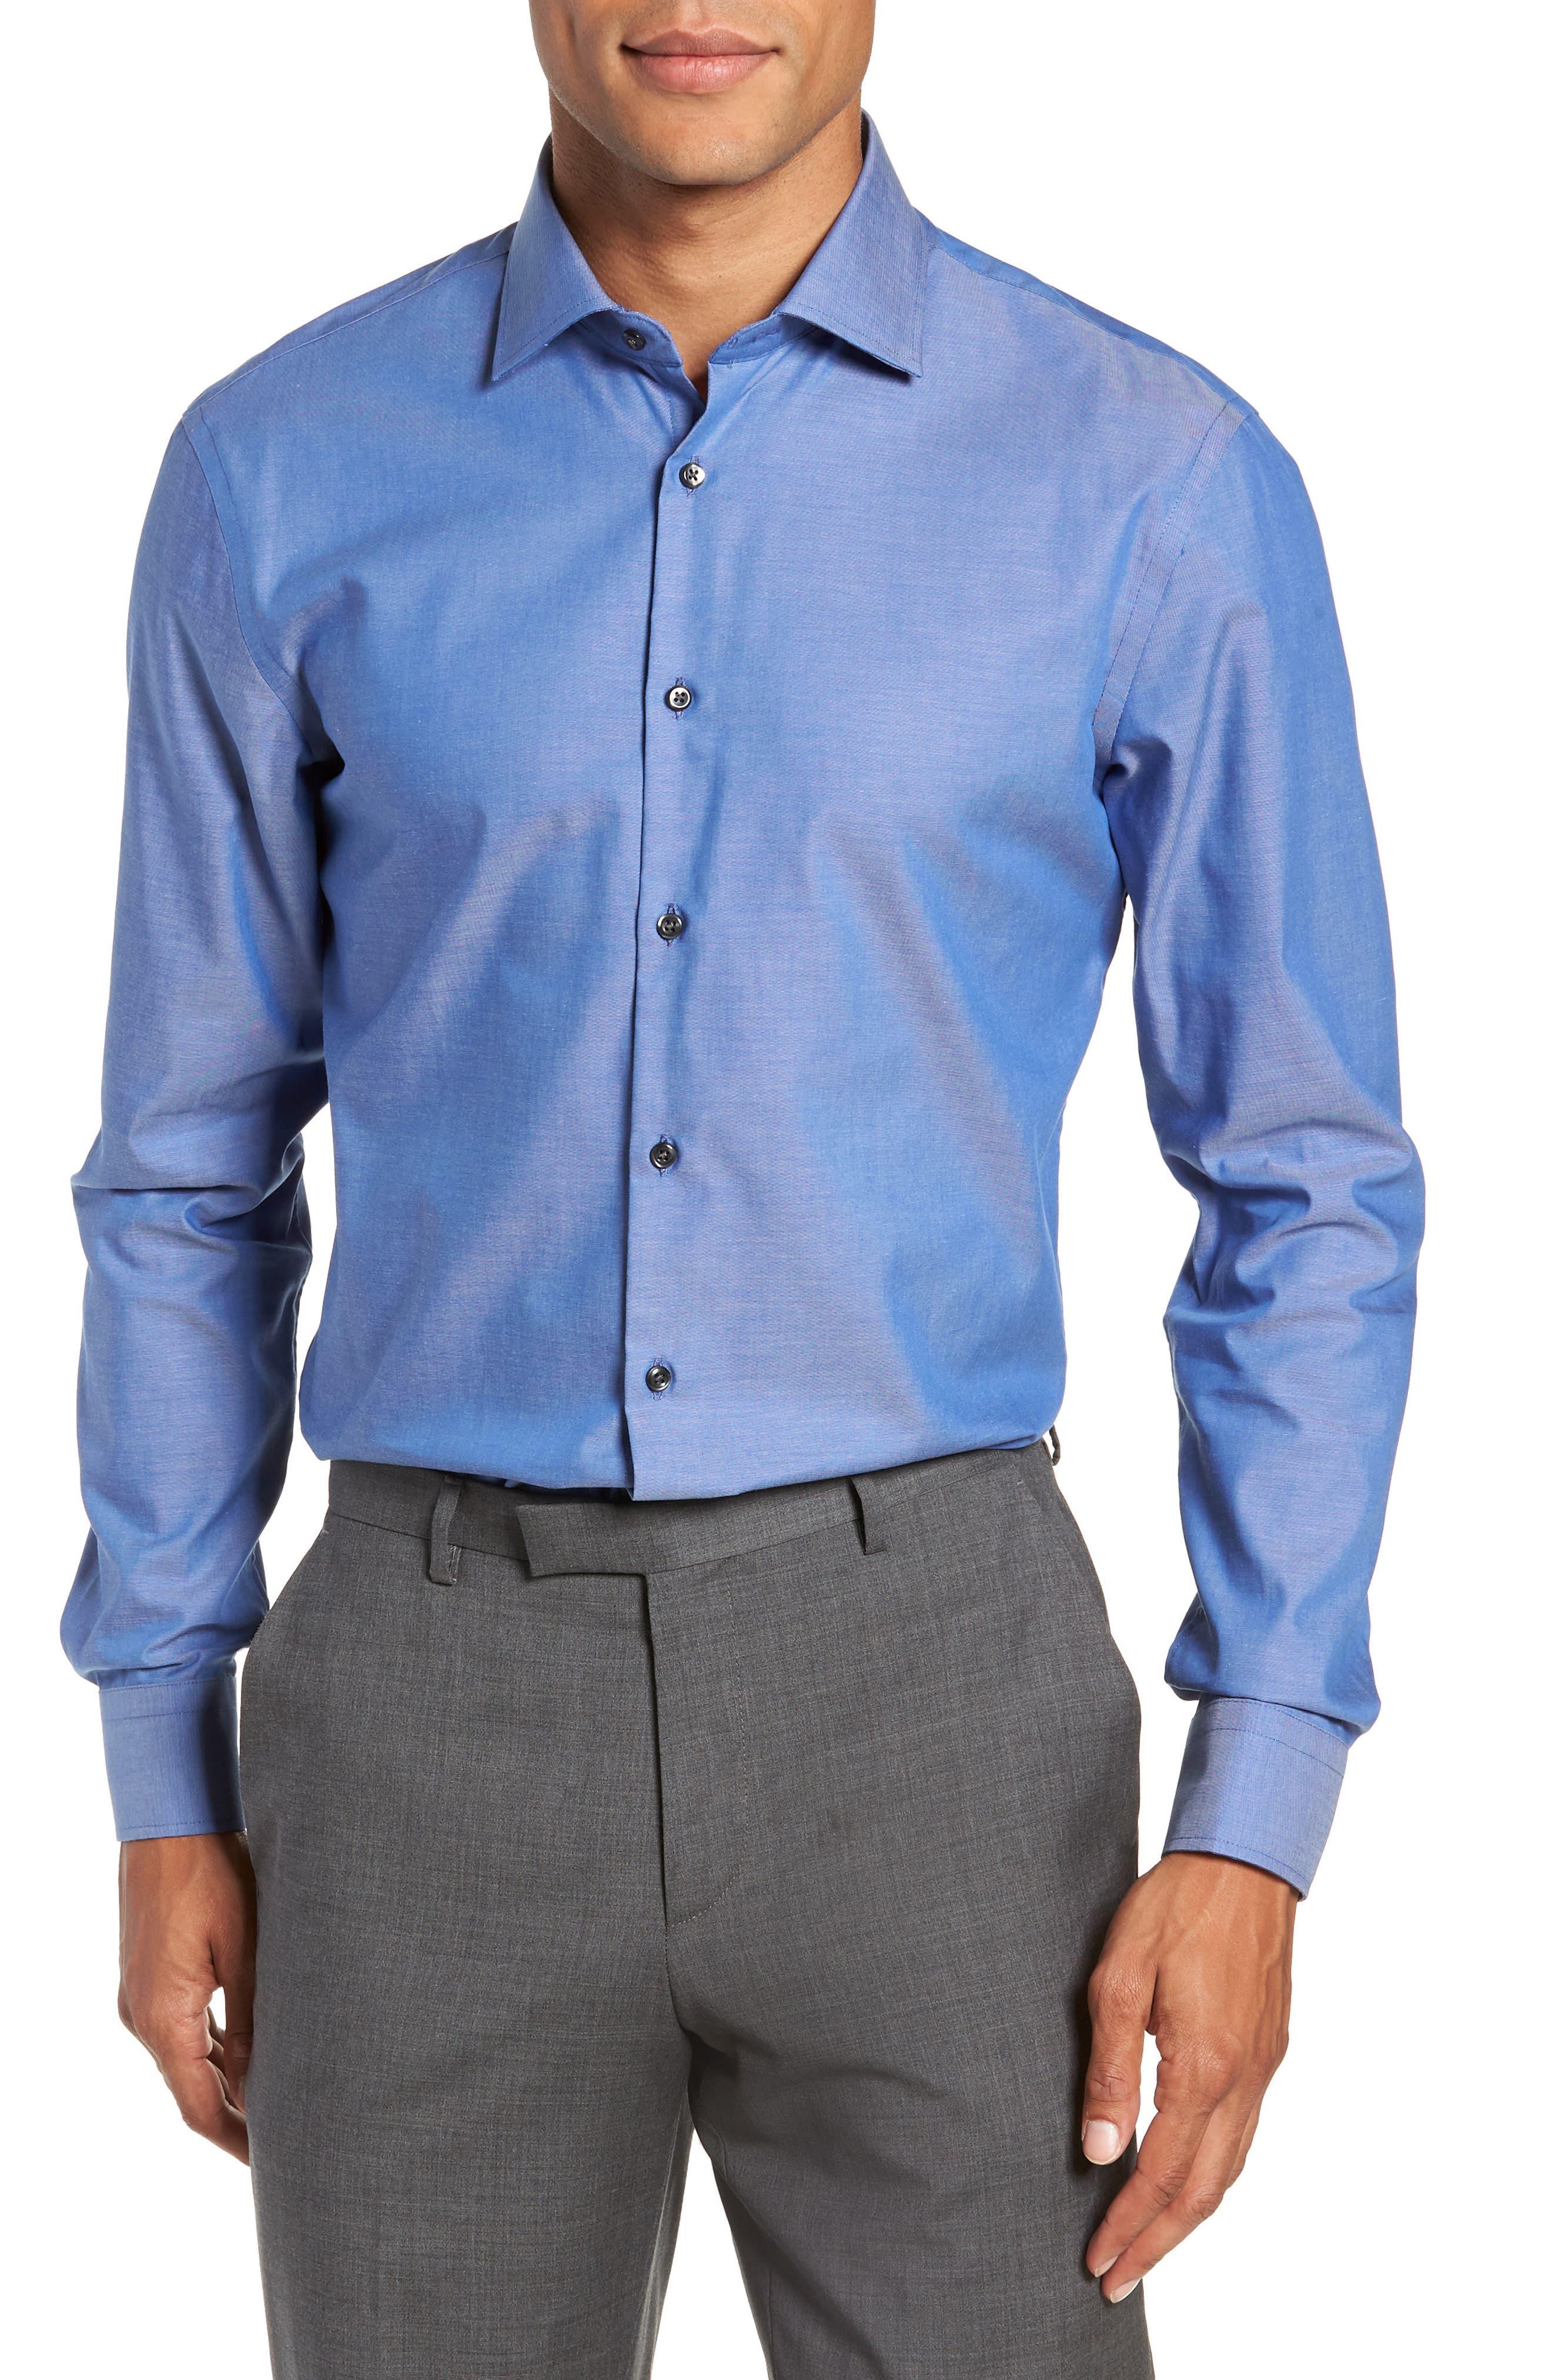 Extra Trim Fit Non-Iron Solid Dress Shirt,                         Main,                         color, BLUE DENIM